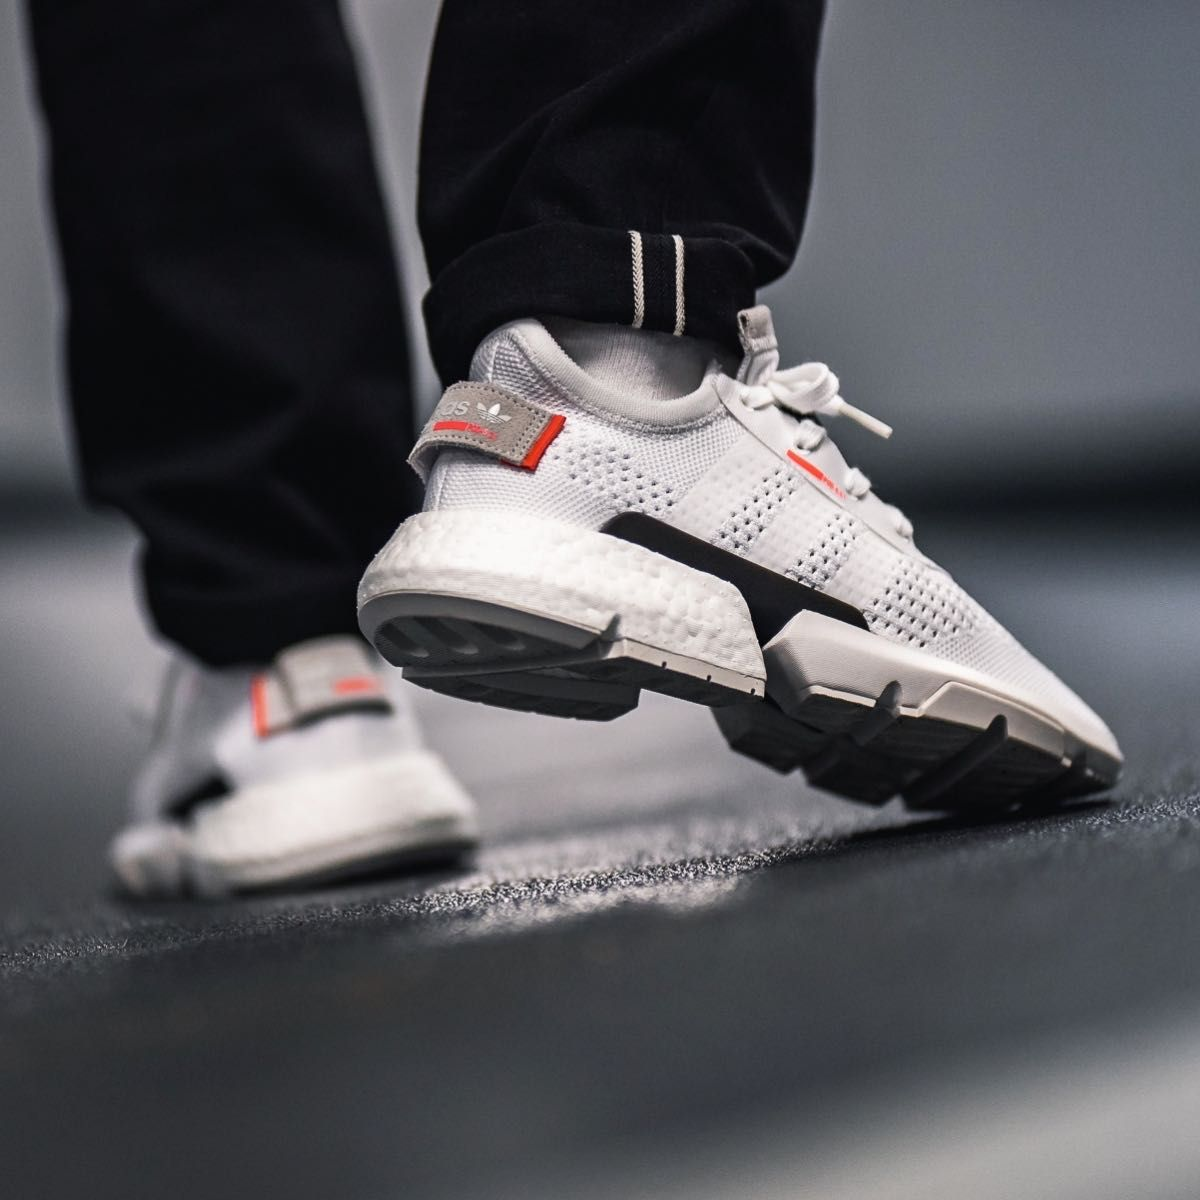 Adidas POD S3.1 White Black sparkar  Sneakers, Sneakers    Adidas POD S3.1 Vit Svart   title=         sparkar   Sneakers, Sneakers